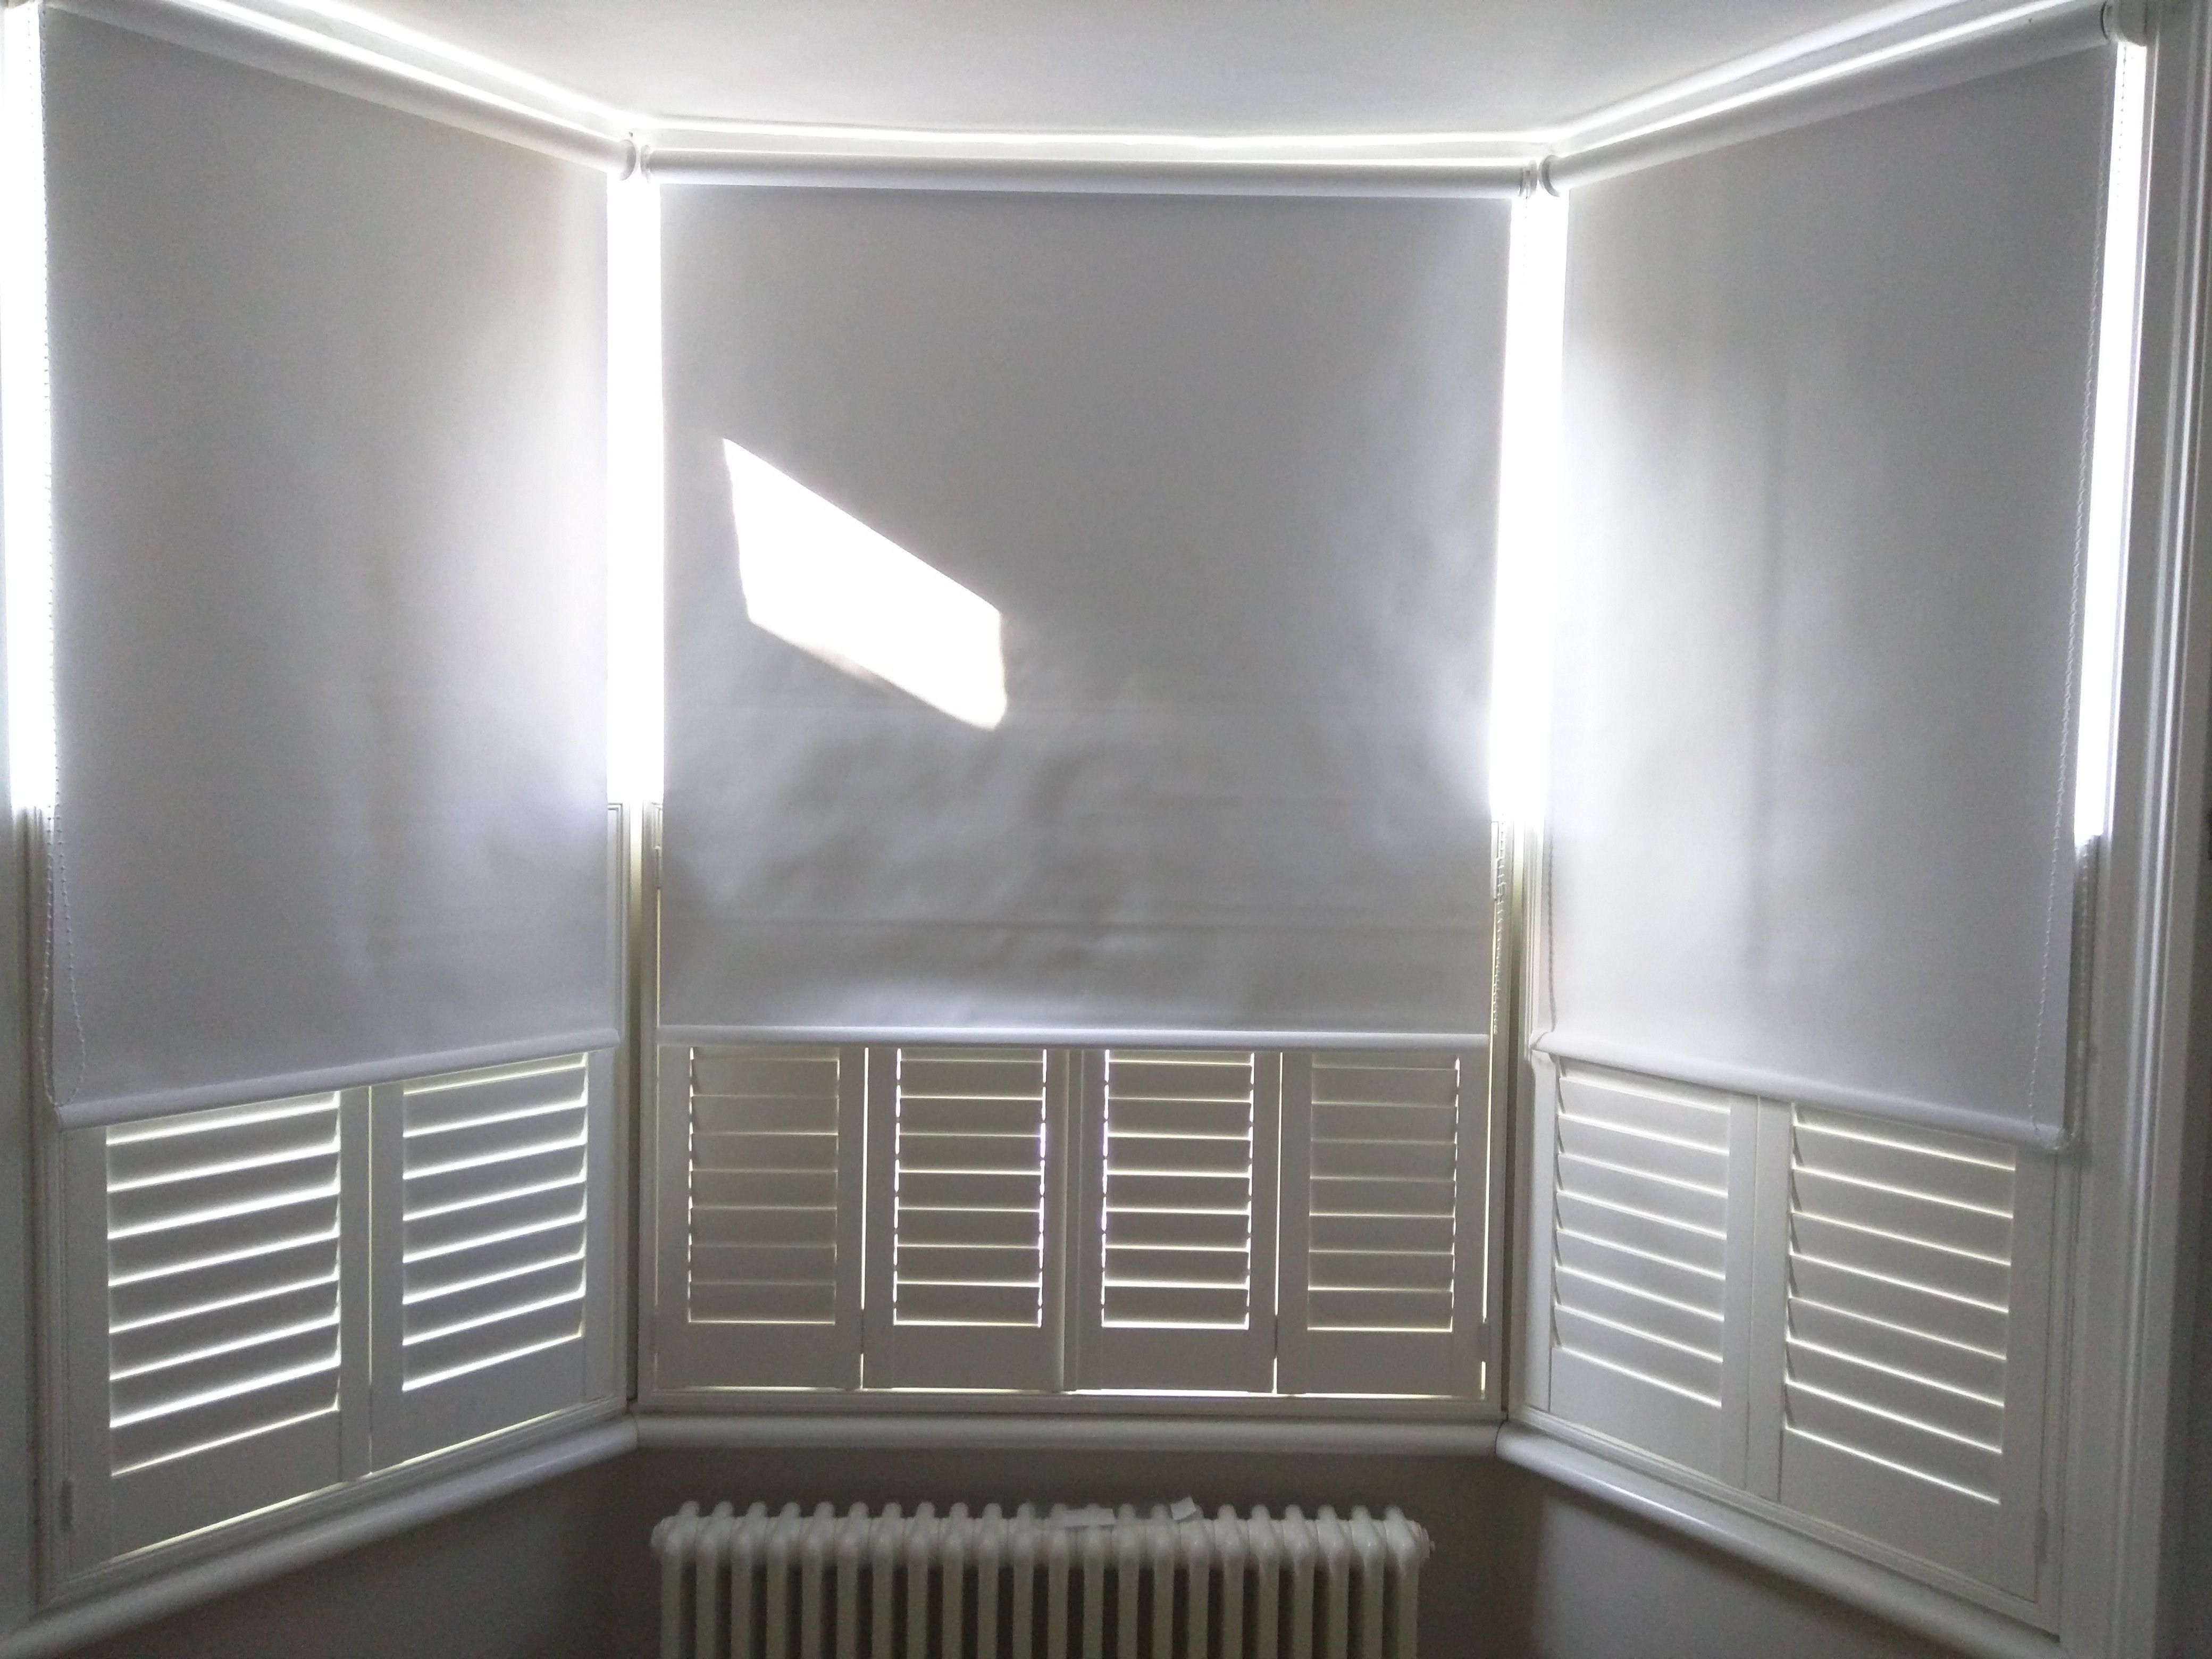 Blackout Roller Blinds With Cafe Half Height Shutters Bay Window Blinds Living Room Blinds Blindslogo Blindsandcu Wooden Blinds Blinds Blinds For Windows